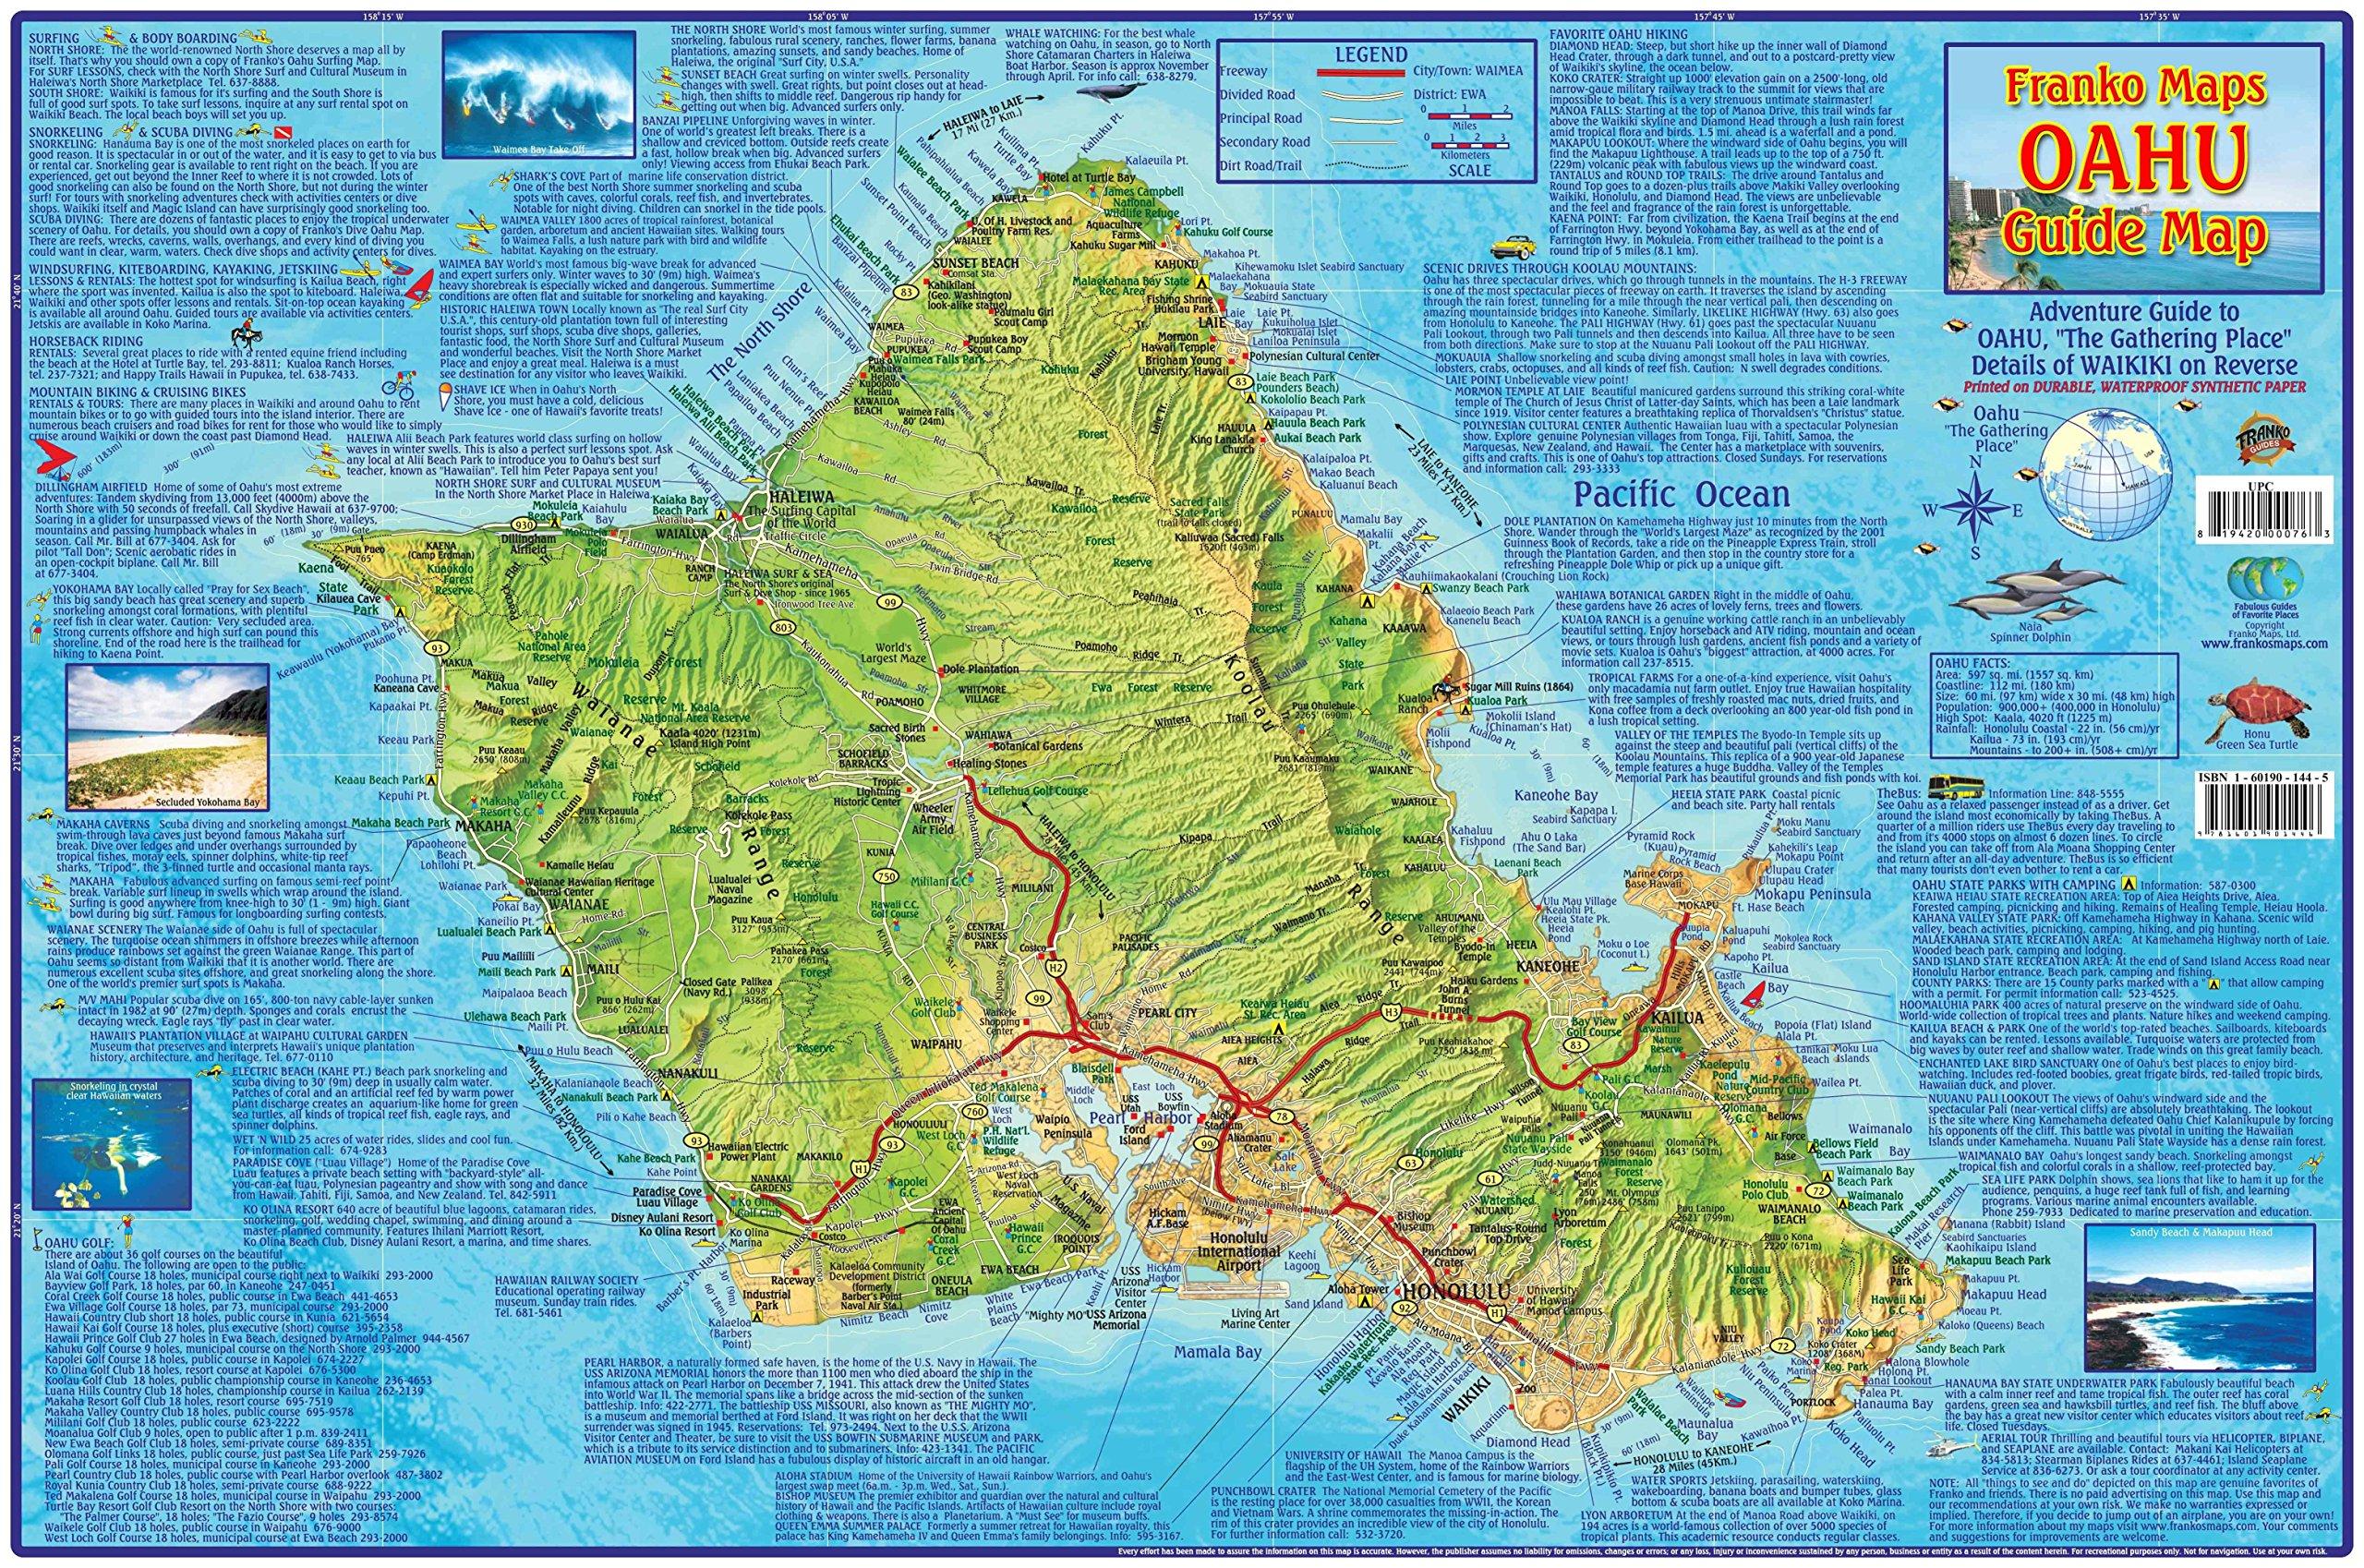 Oahu Hawaii Adventure Map Franko Maps Laminated Poster Franko Maps Ltd 9781601901569 Amazon Com Books